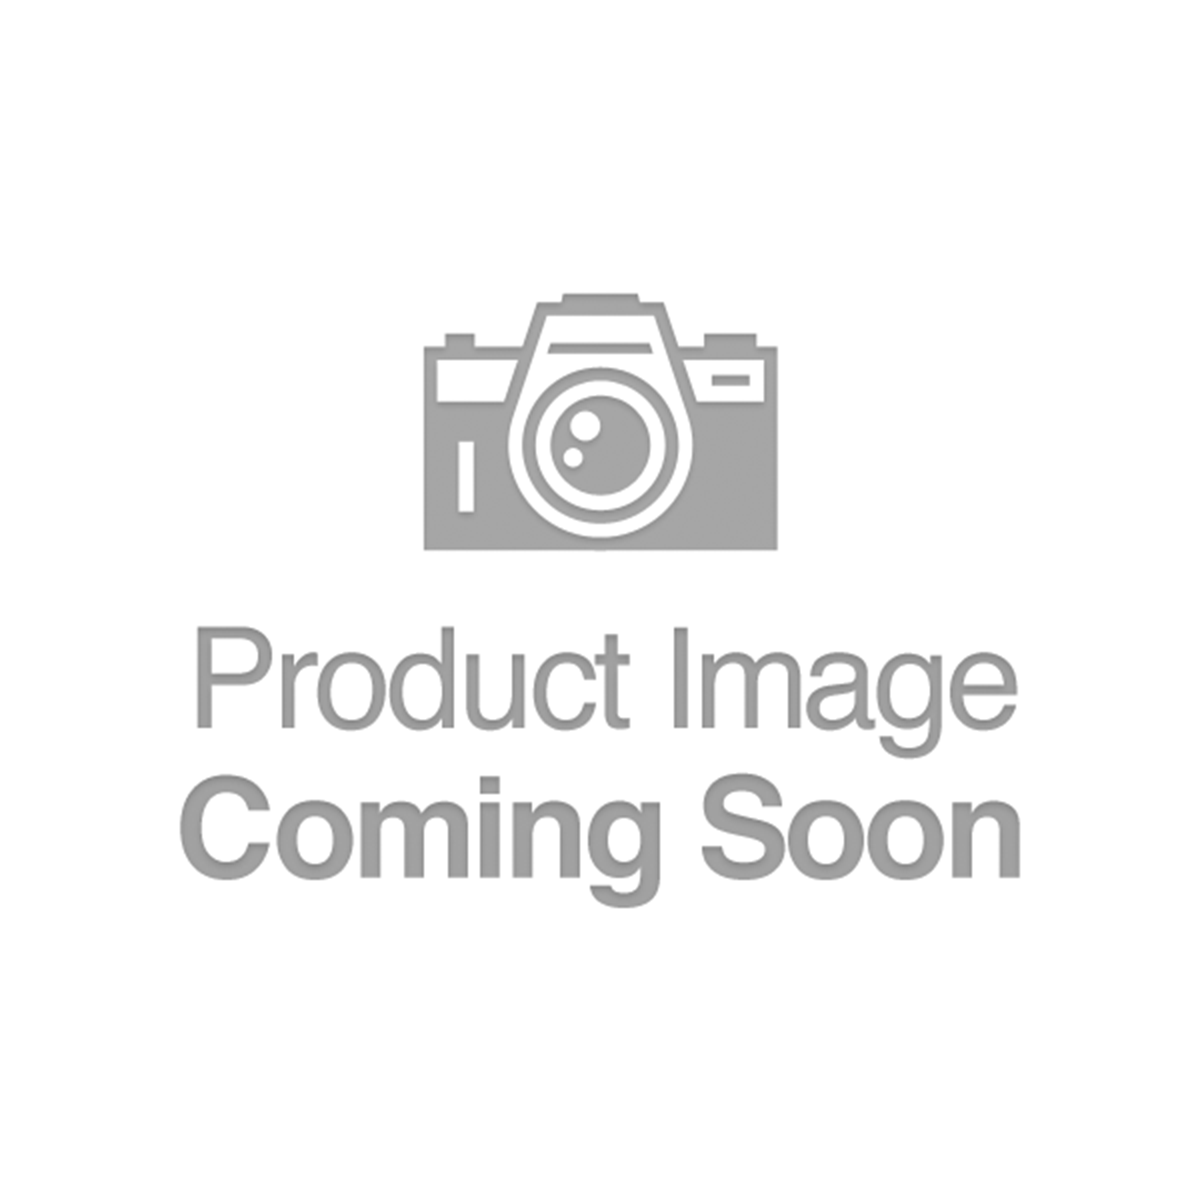 Winslow - Arizona - CH 12581 - FR 609 - PMG 55 - National Bank Note